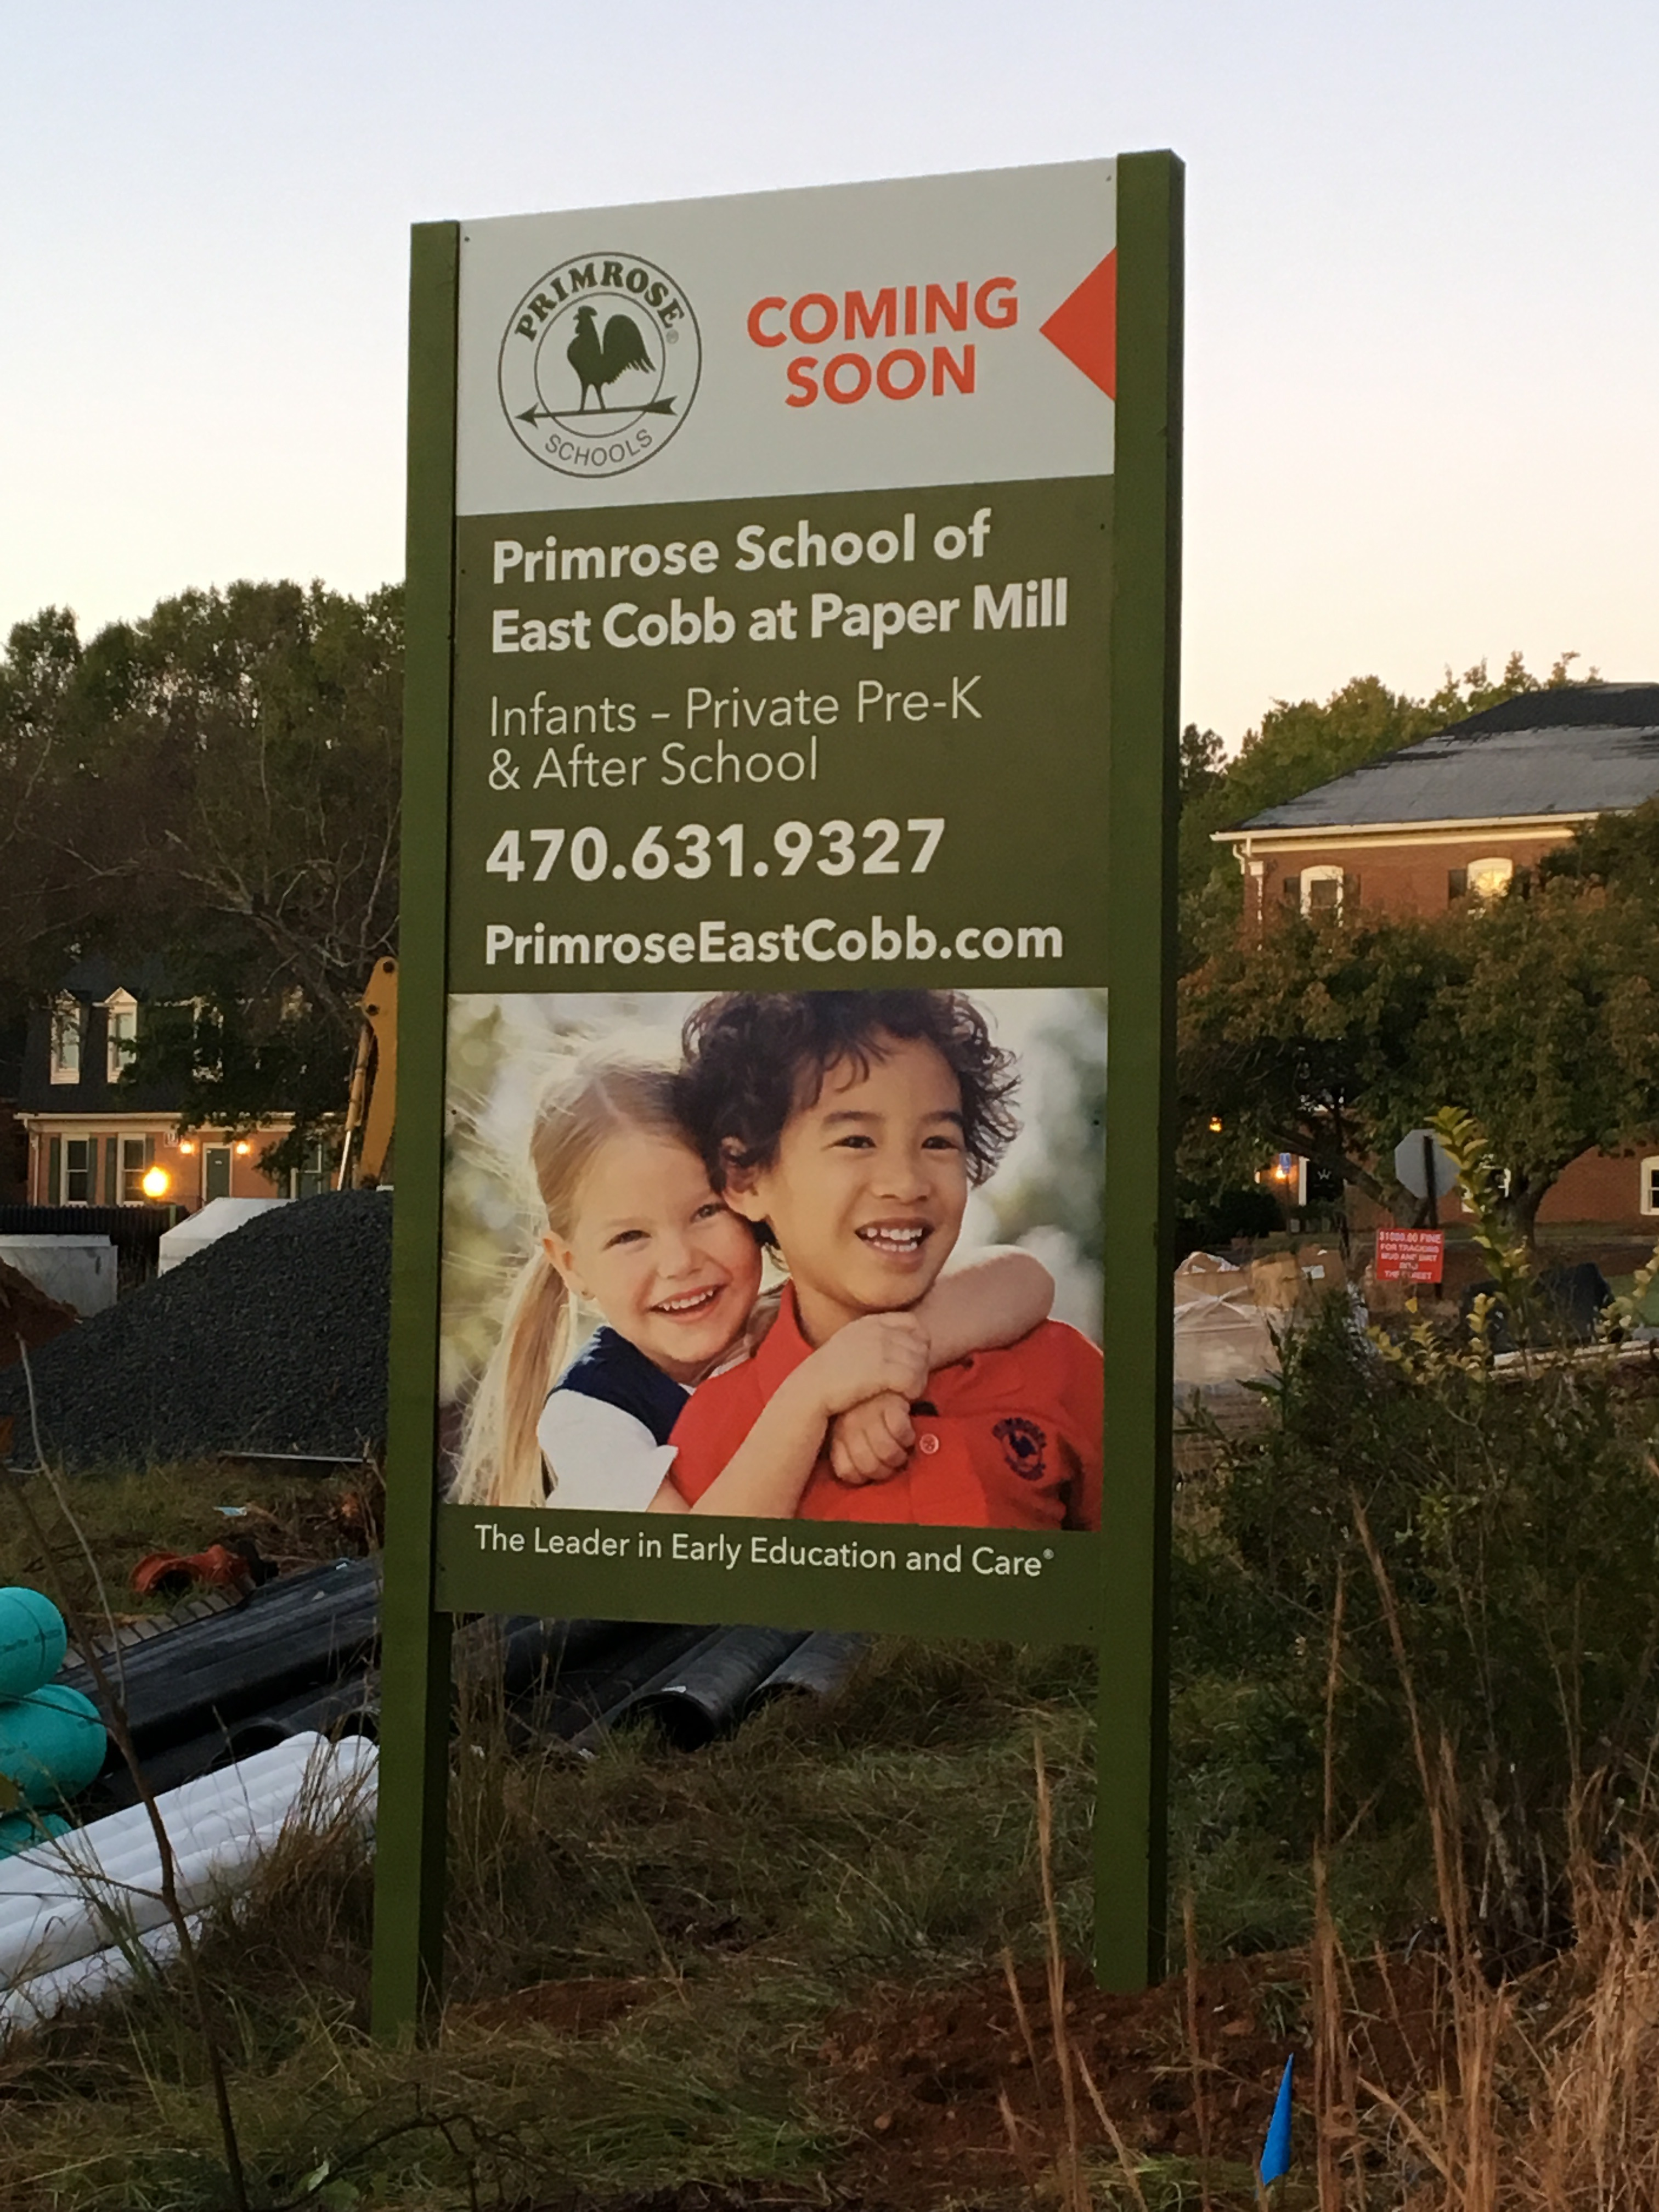 Primrose School of East Cobb at Paper Mill Coming Soon